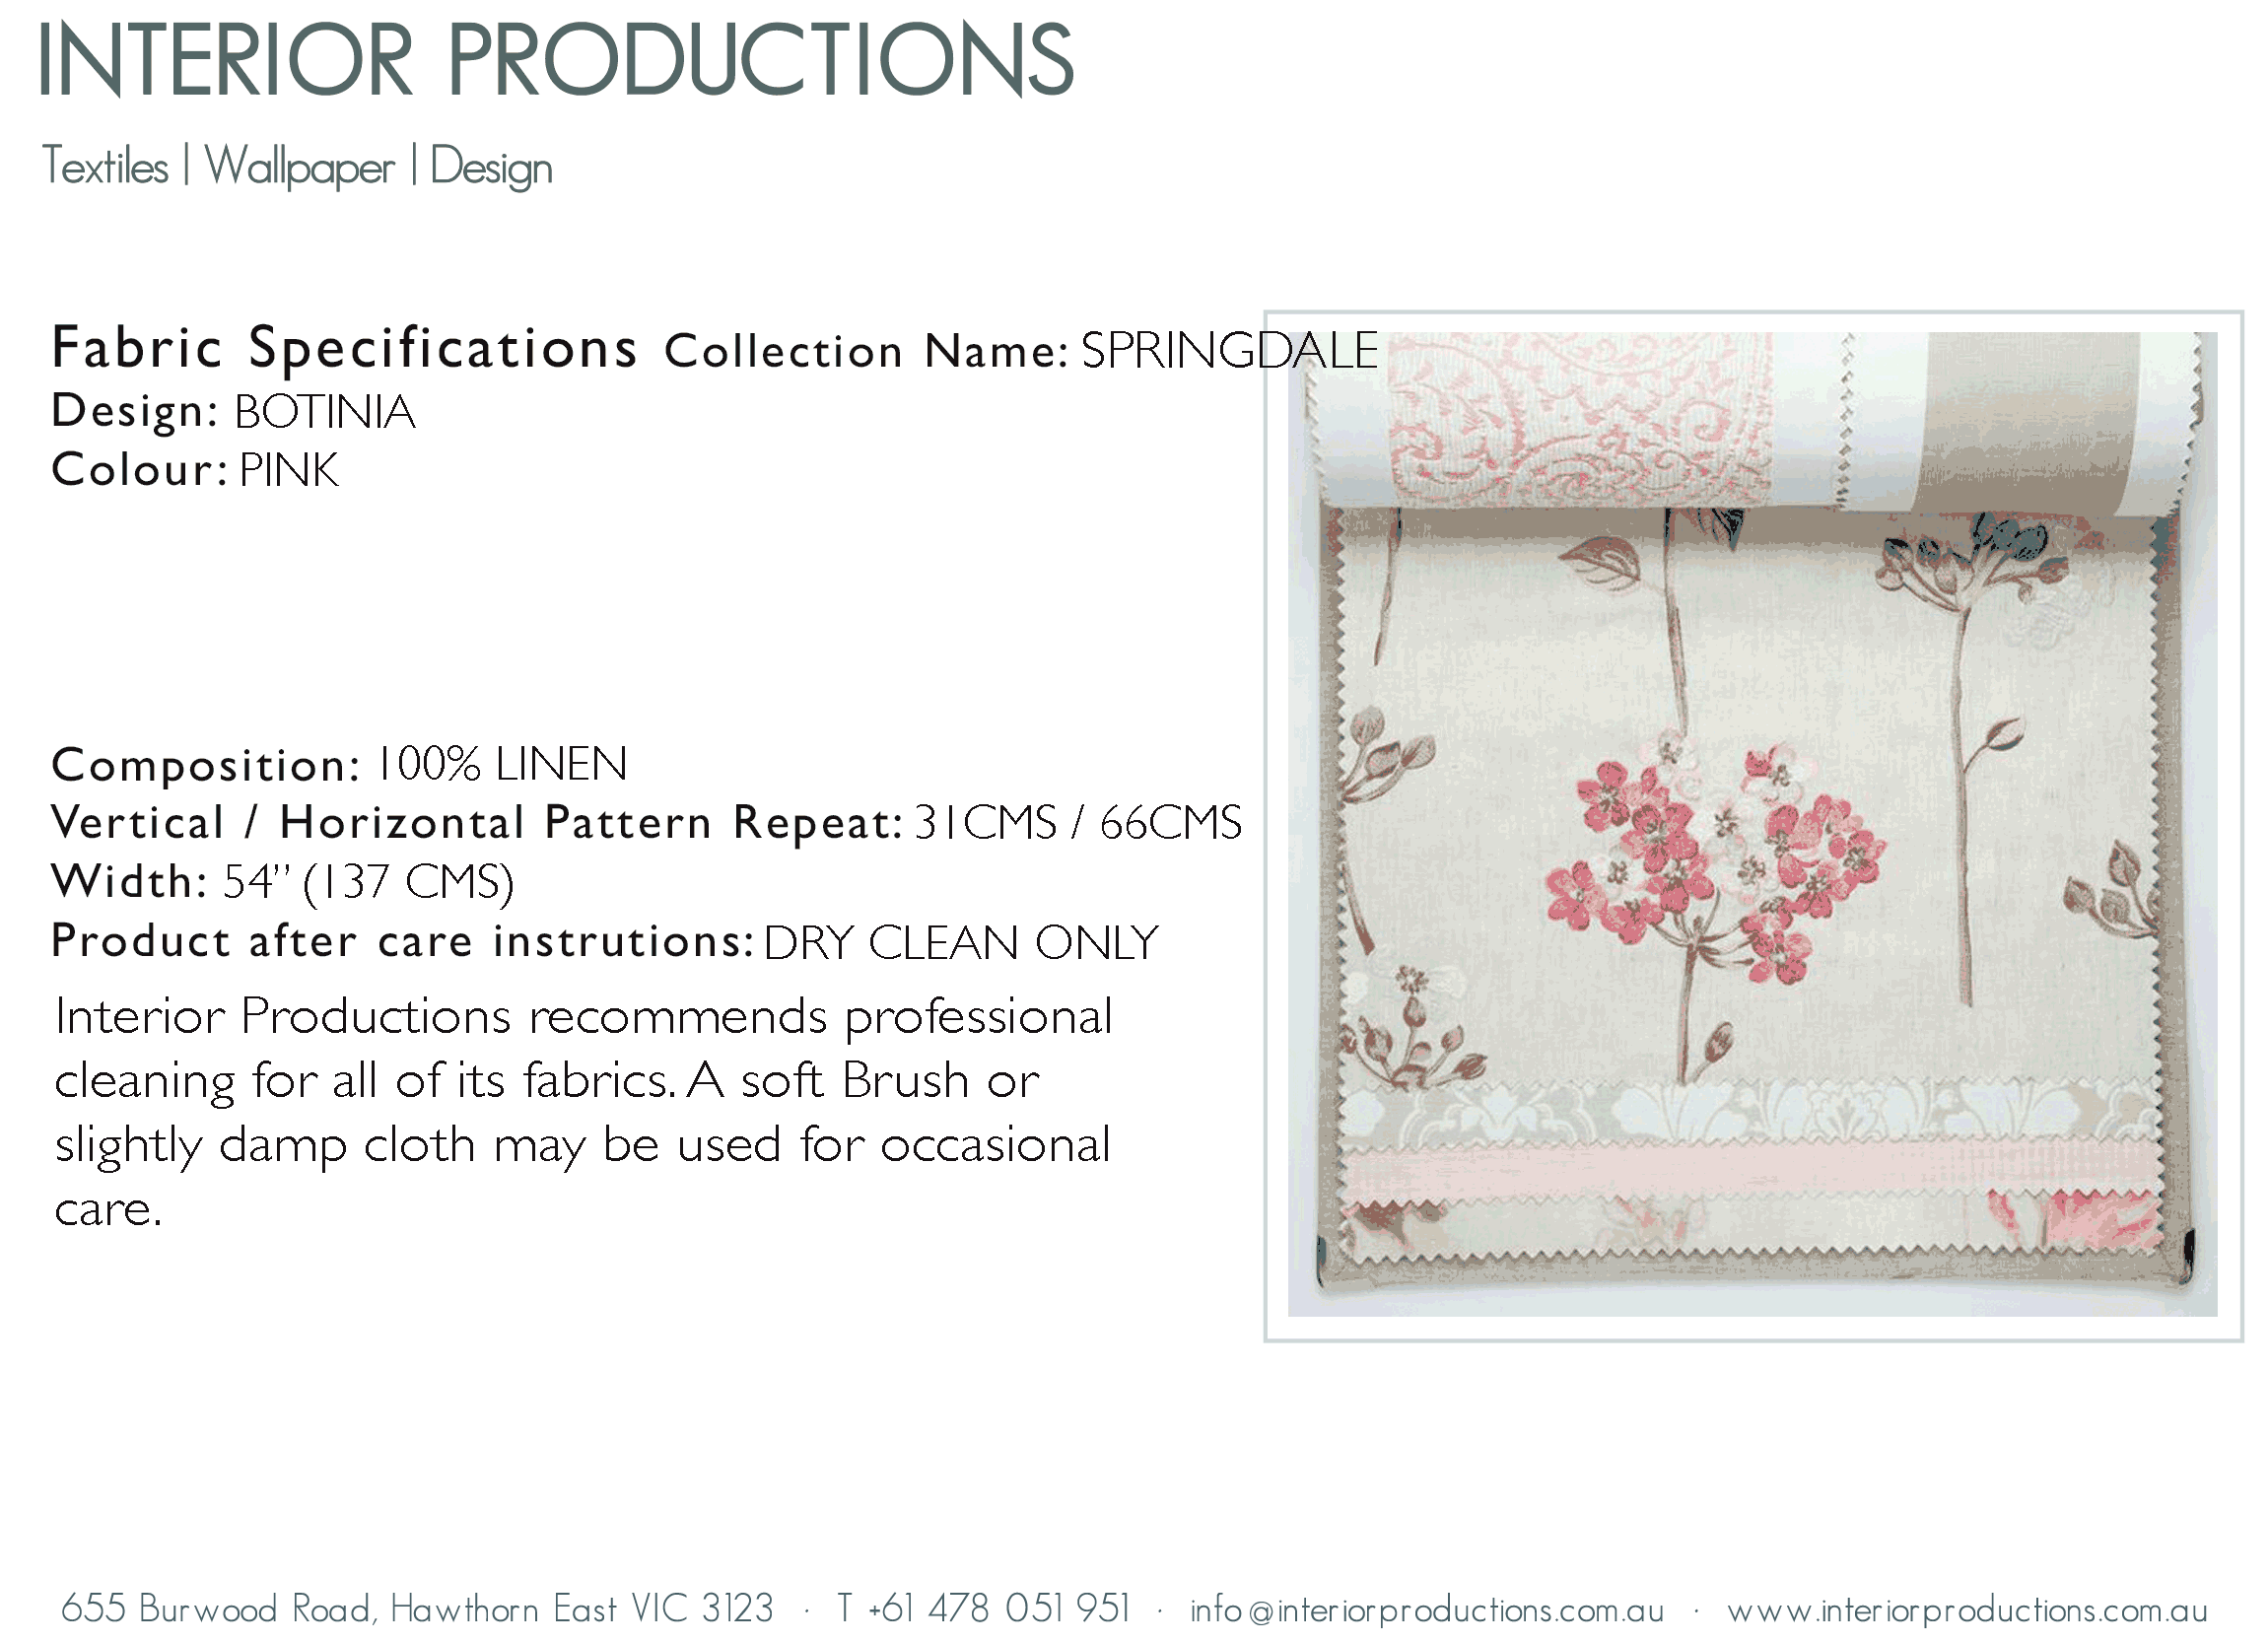 interior_productions_BOTINIA---PINK